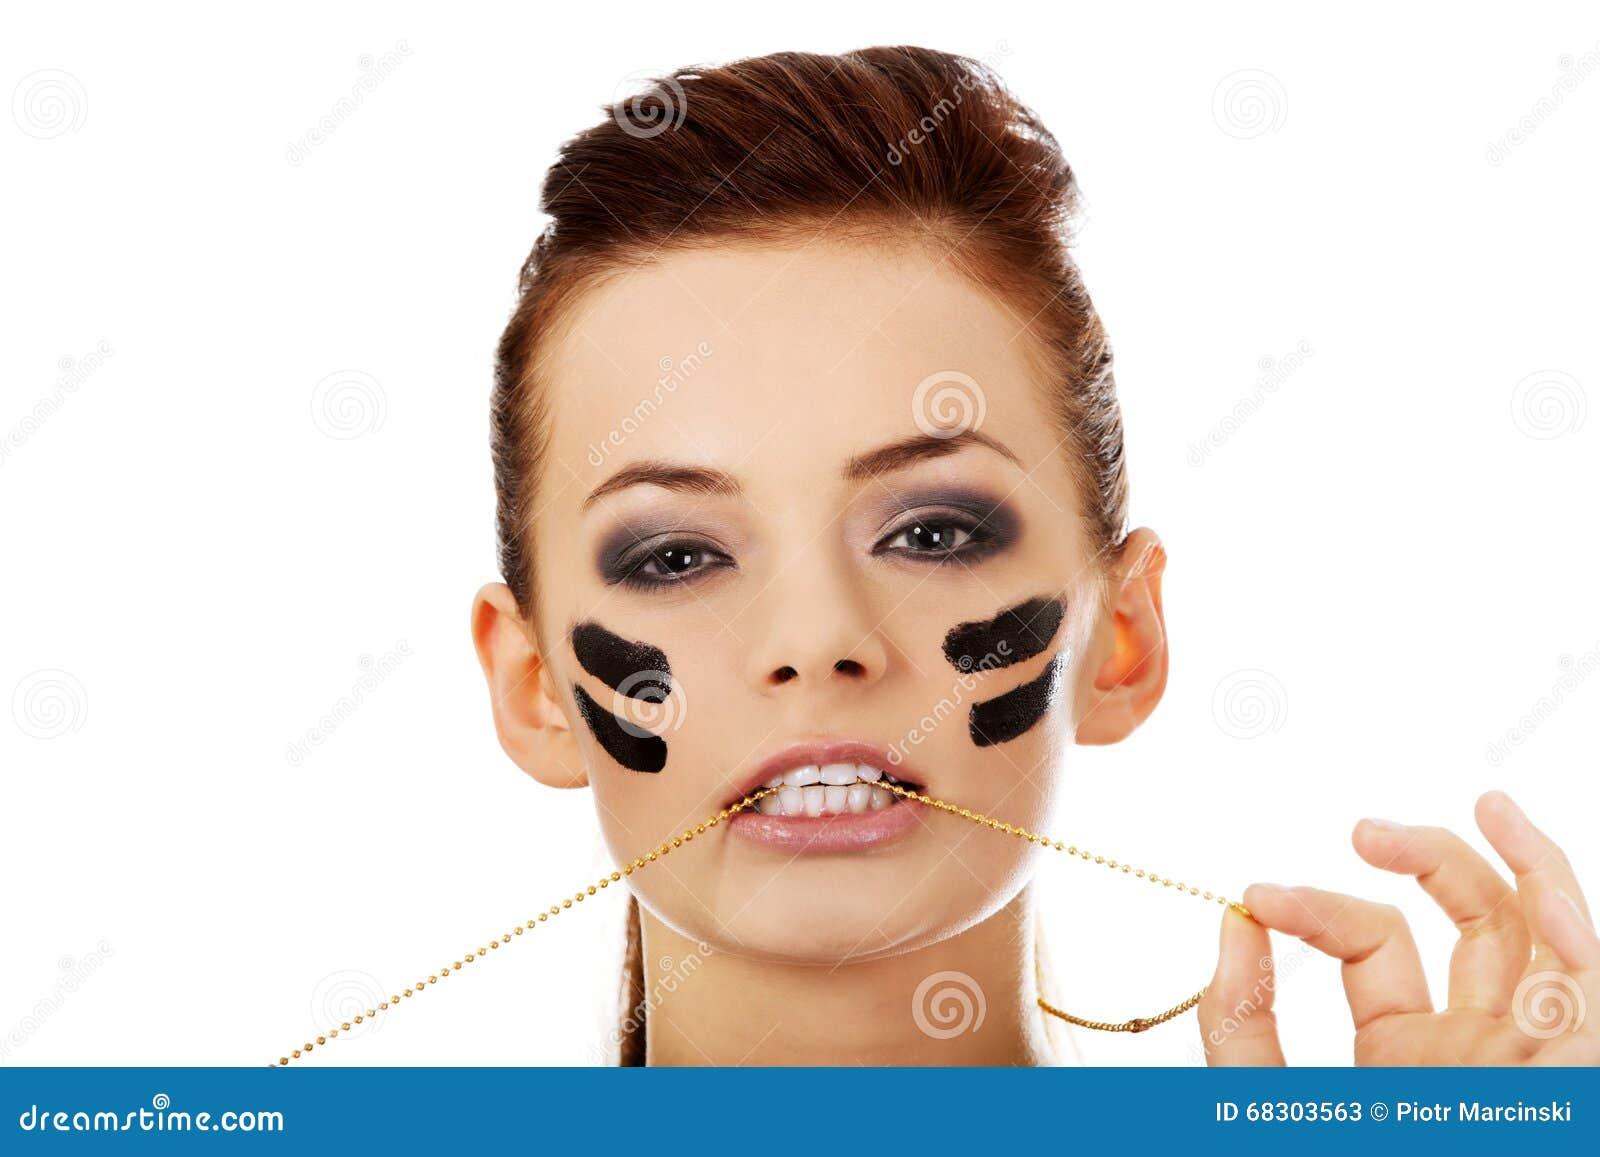 Aggressive military woman bites a military dog tag